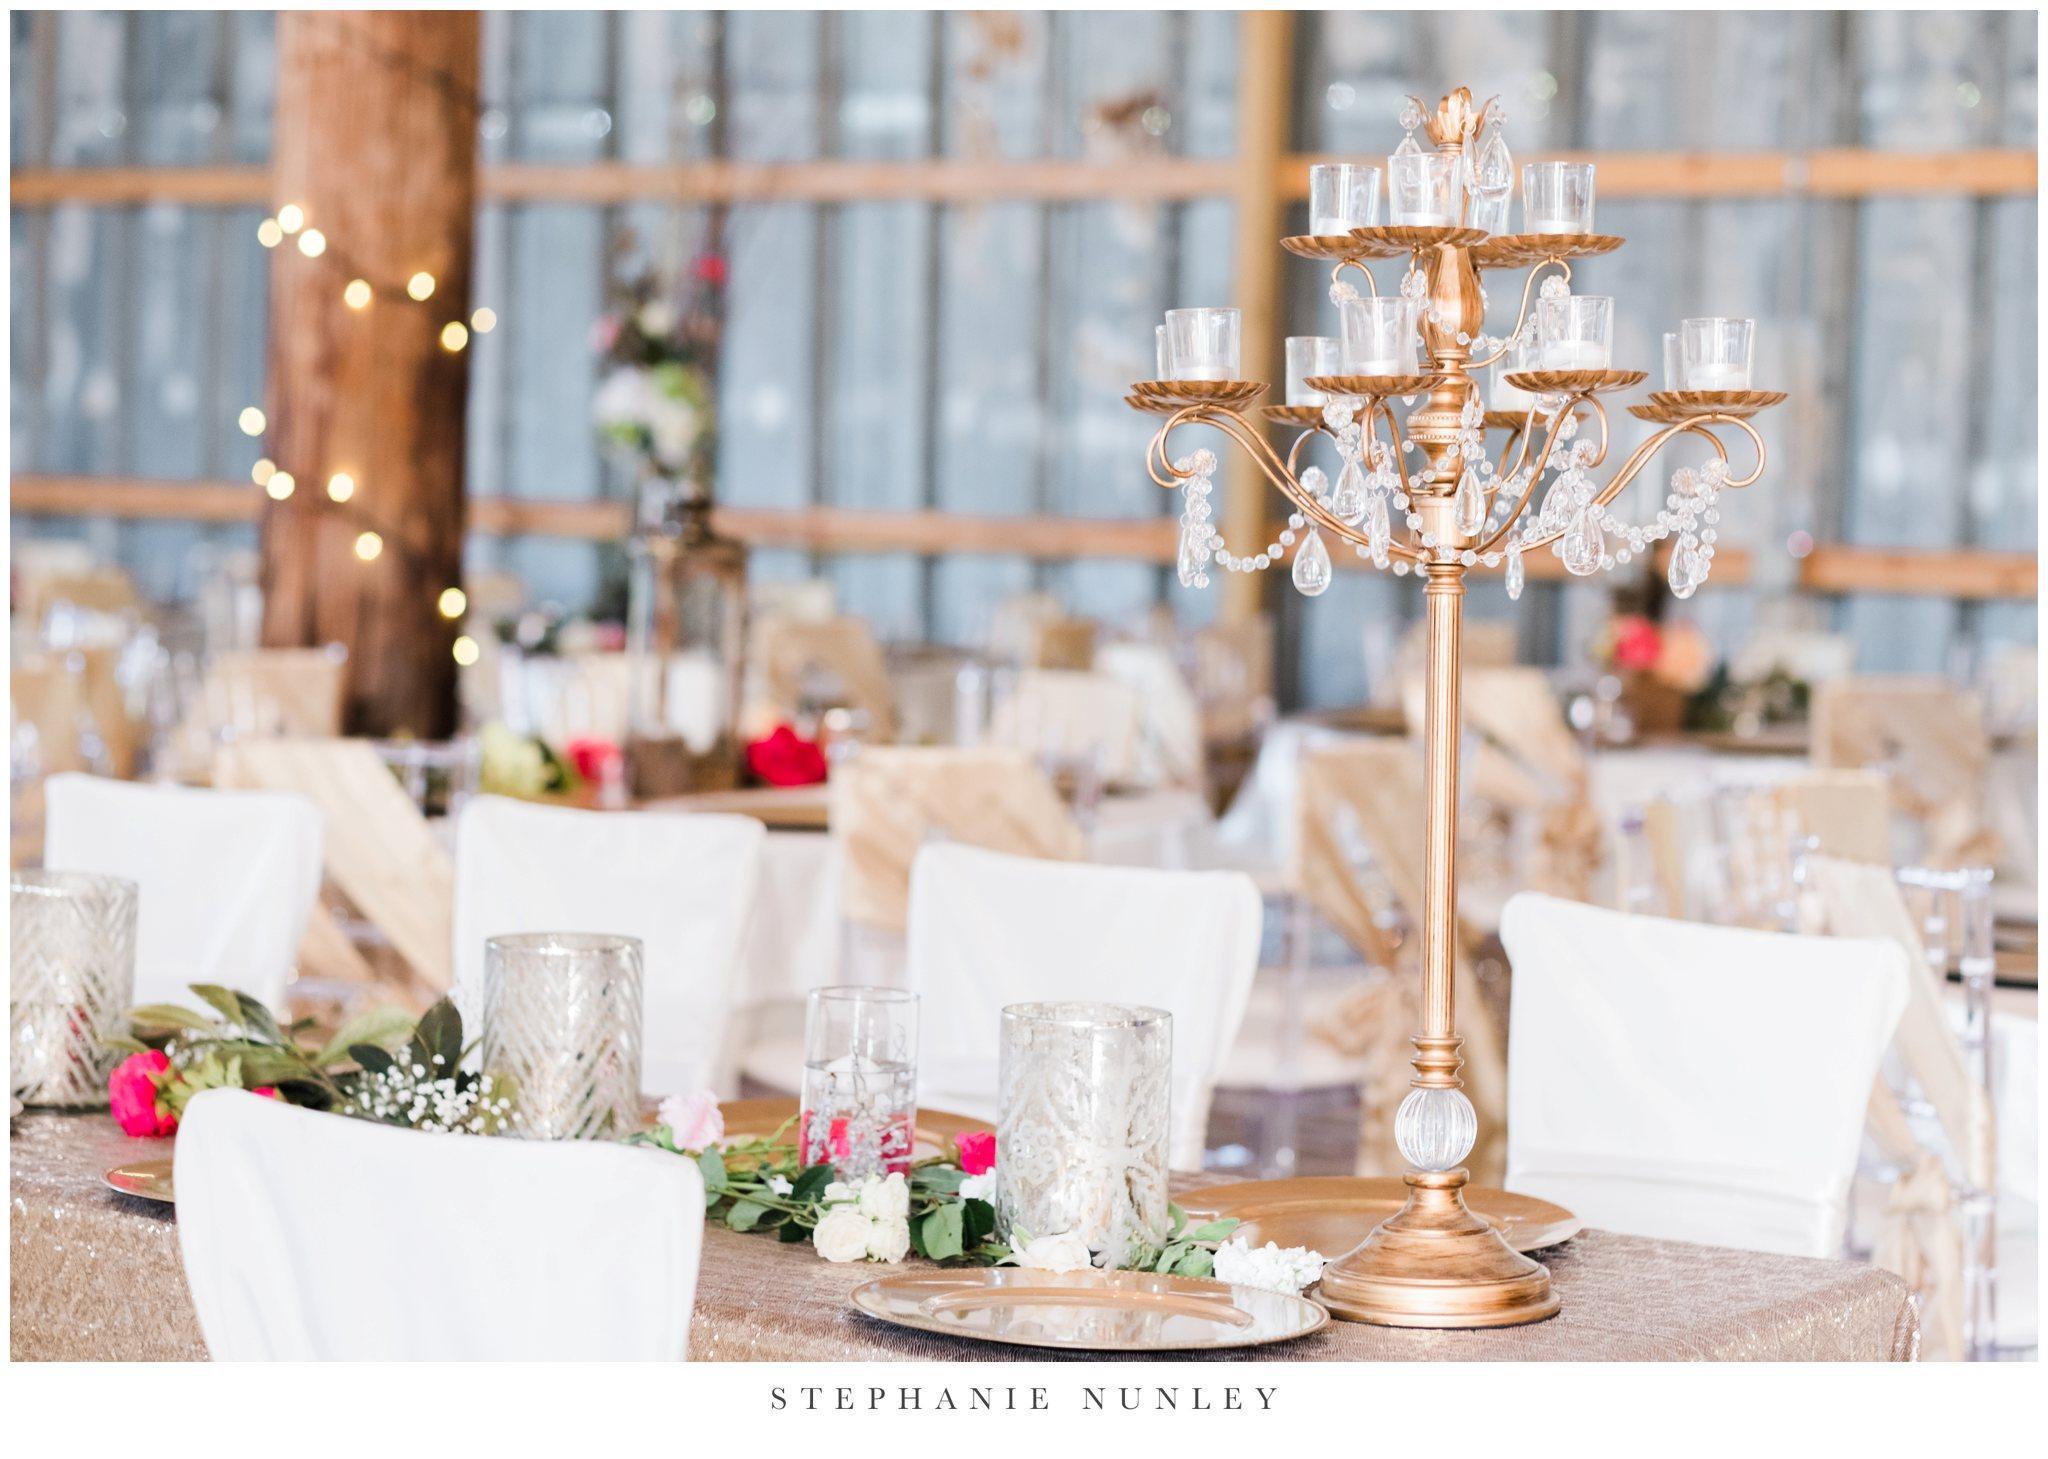 romantic-outdoor-wedding-with-flower-crown-0111.jpg